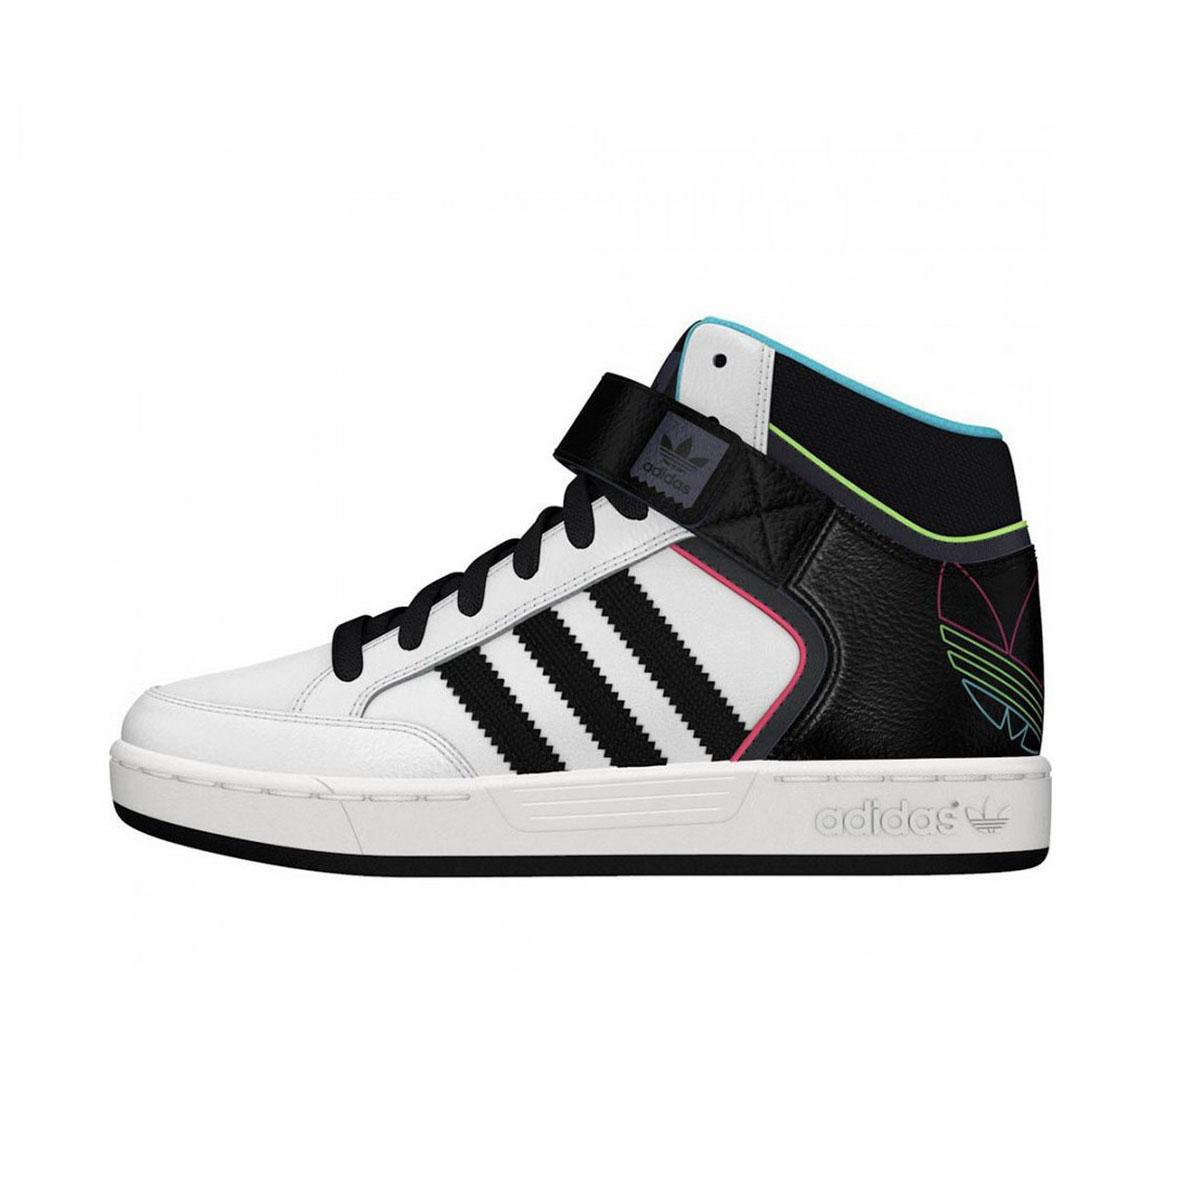 5305f18357a Adidas deeije patike VARIAL MID J D68703 - Idealno.rs